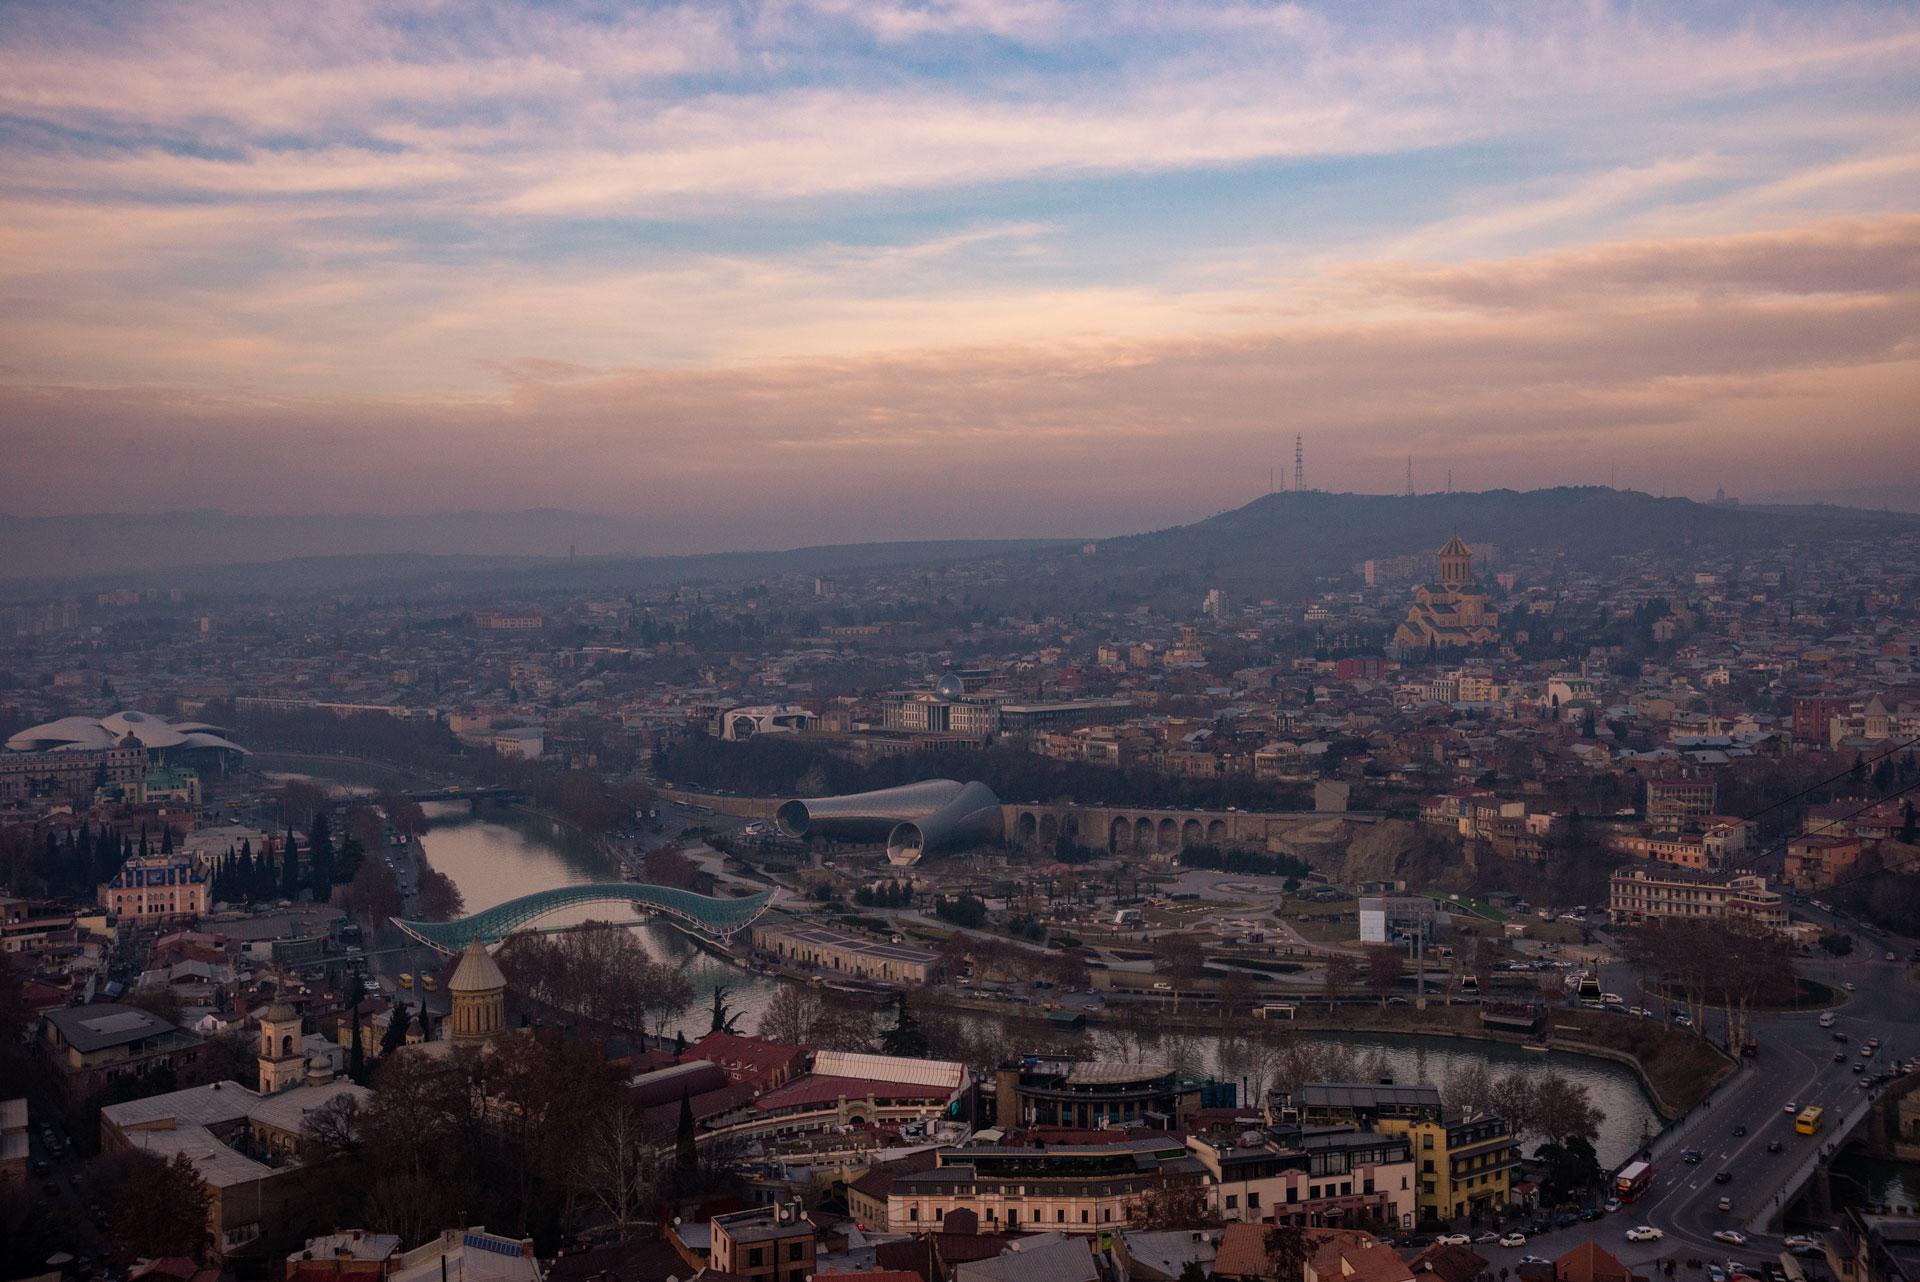 Tbilisi at sunset.